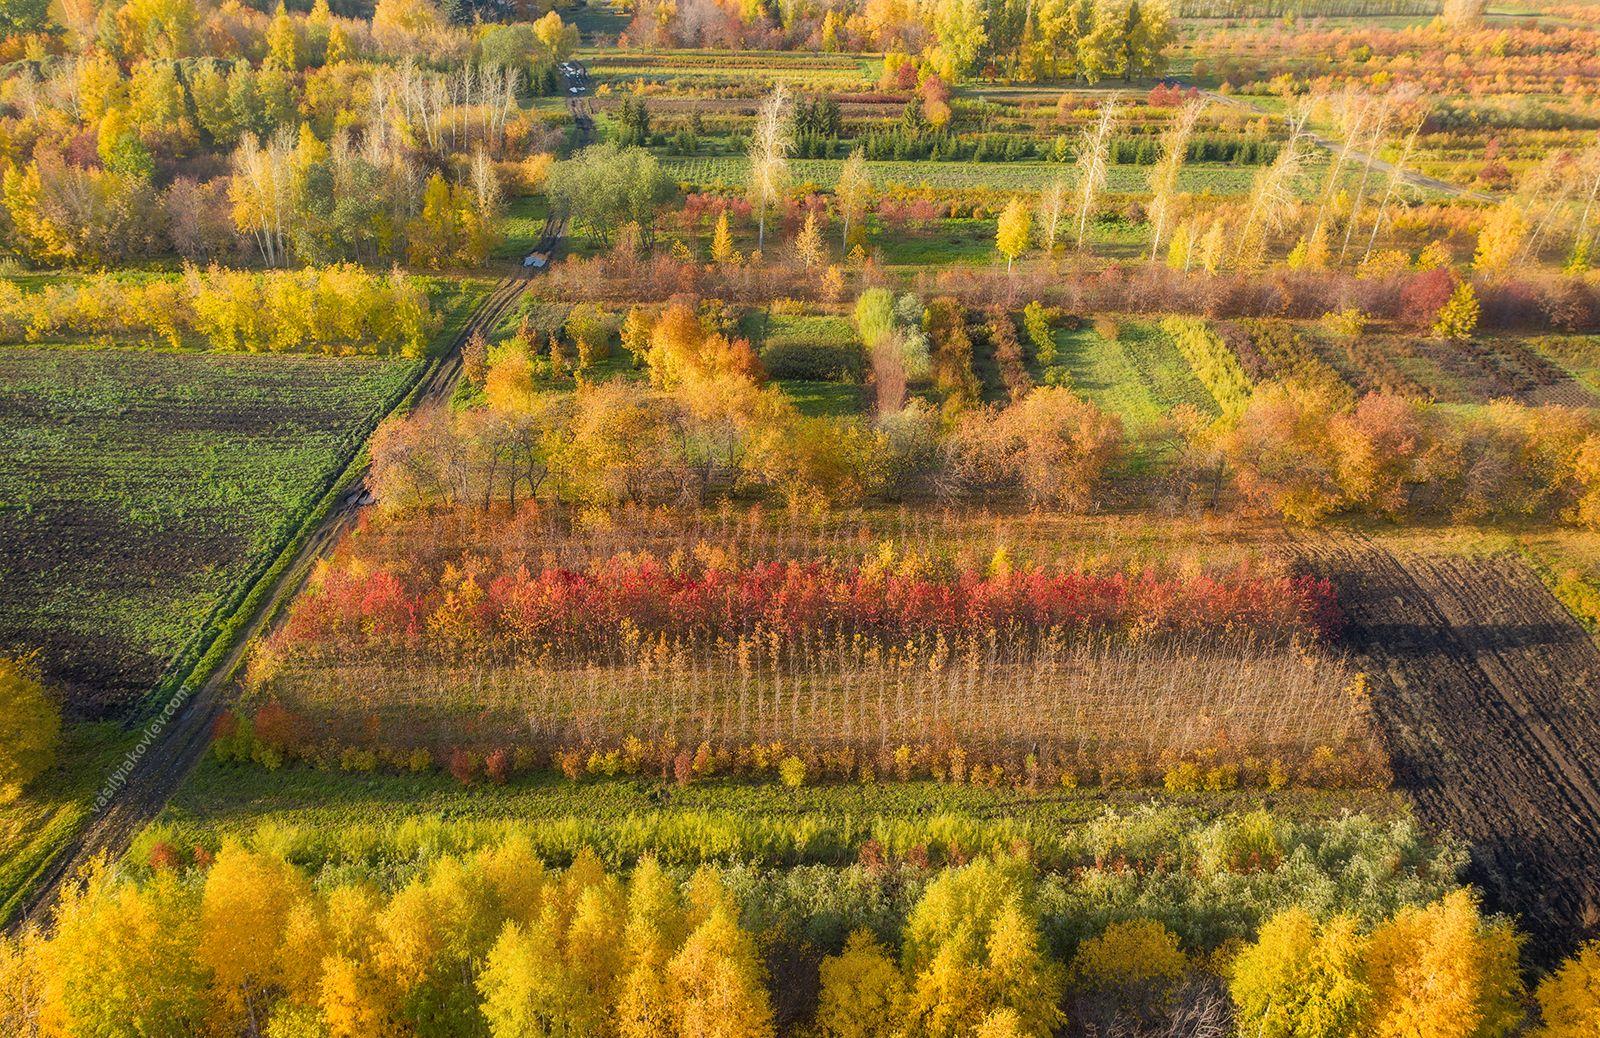 Осенний калейдоскоп 2020 екатеринбург урал фототур яковлевфототур василийяковлев